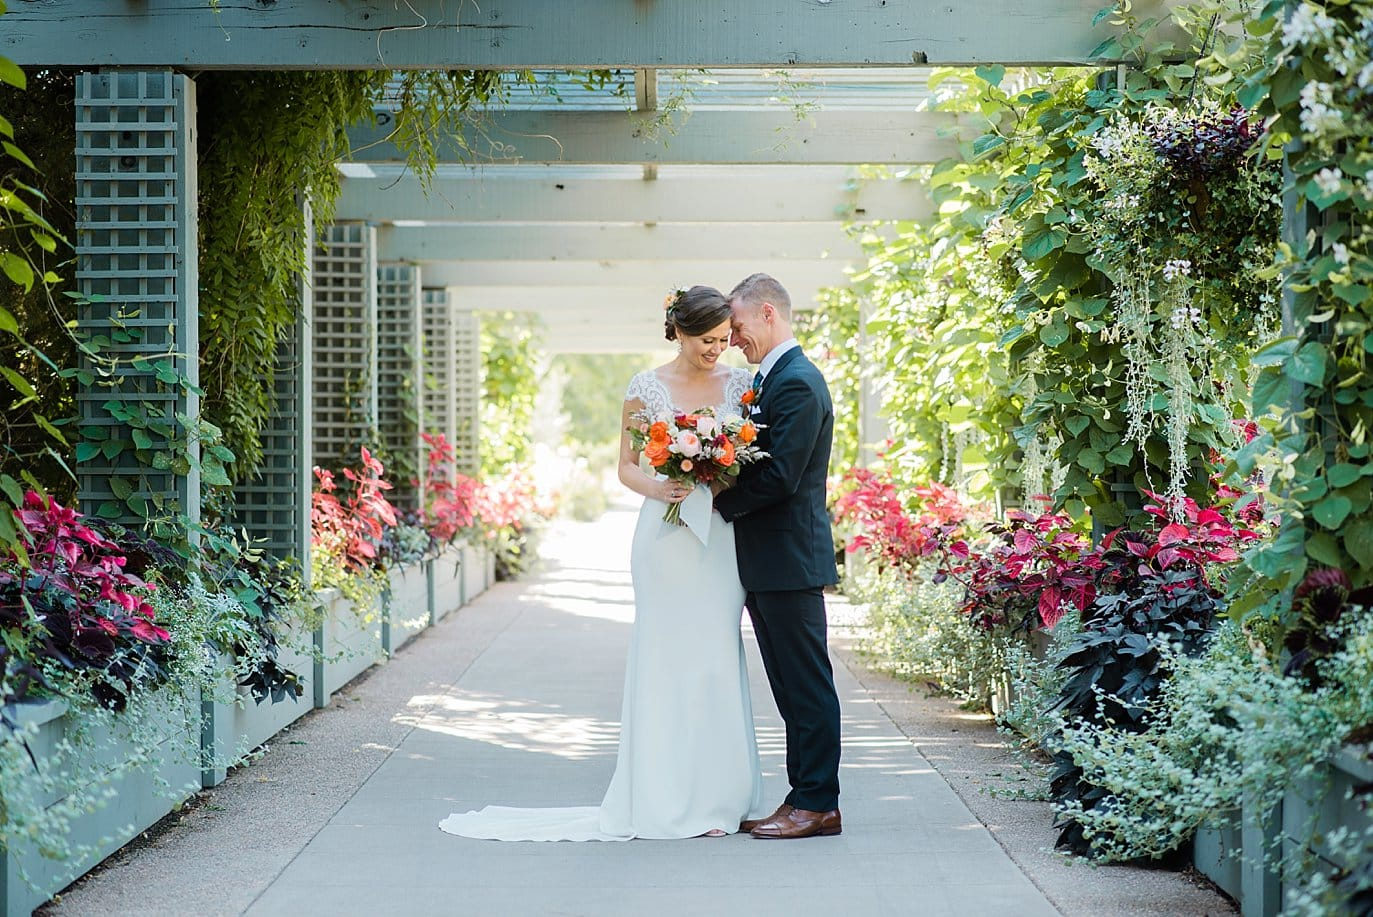 bride and groom under arbor at Denver Botanic Gardens wedding by Denver Wedding Photographer Jennie Crate Photographer